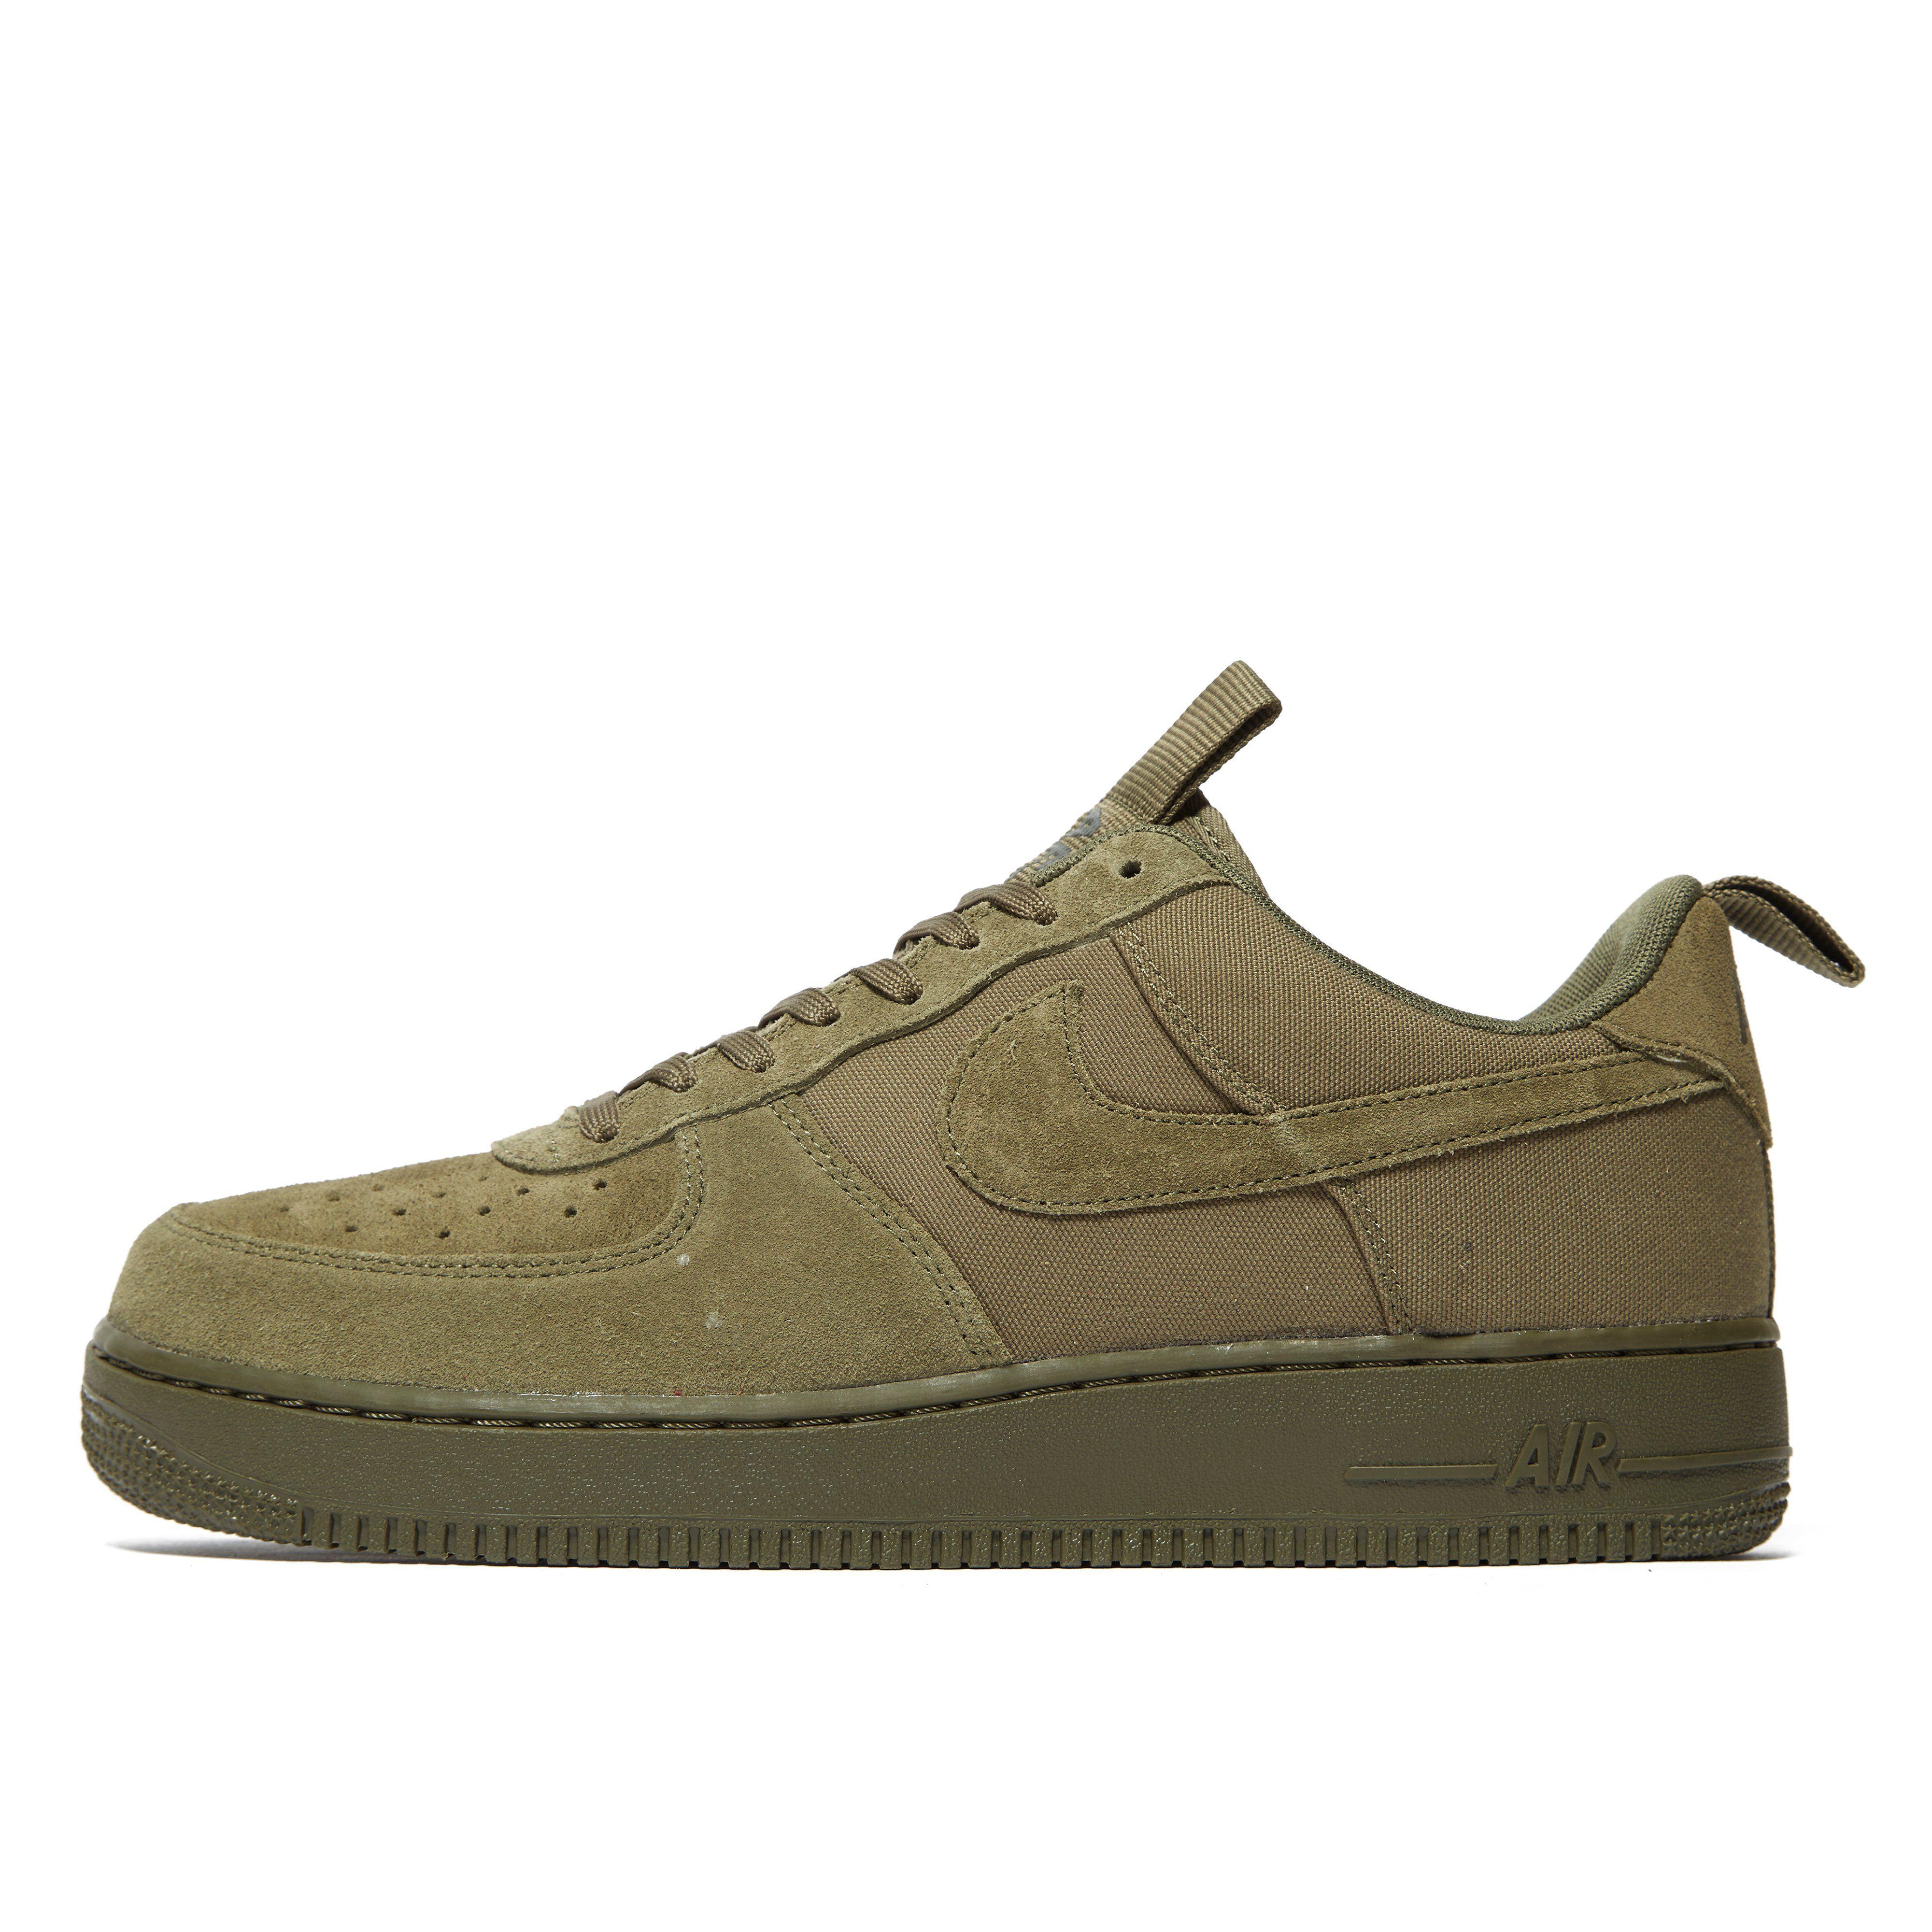 Vert Chaussures Nike Air Force Pour Les Hommes VdPDZvflt